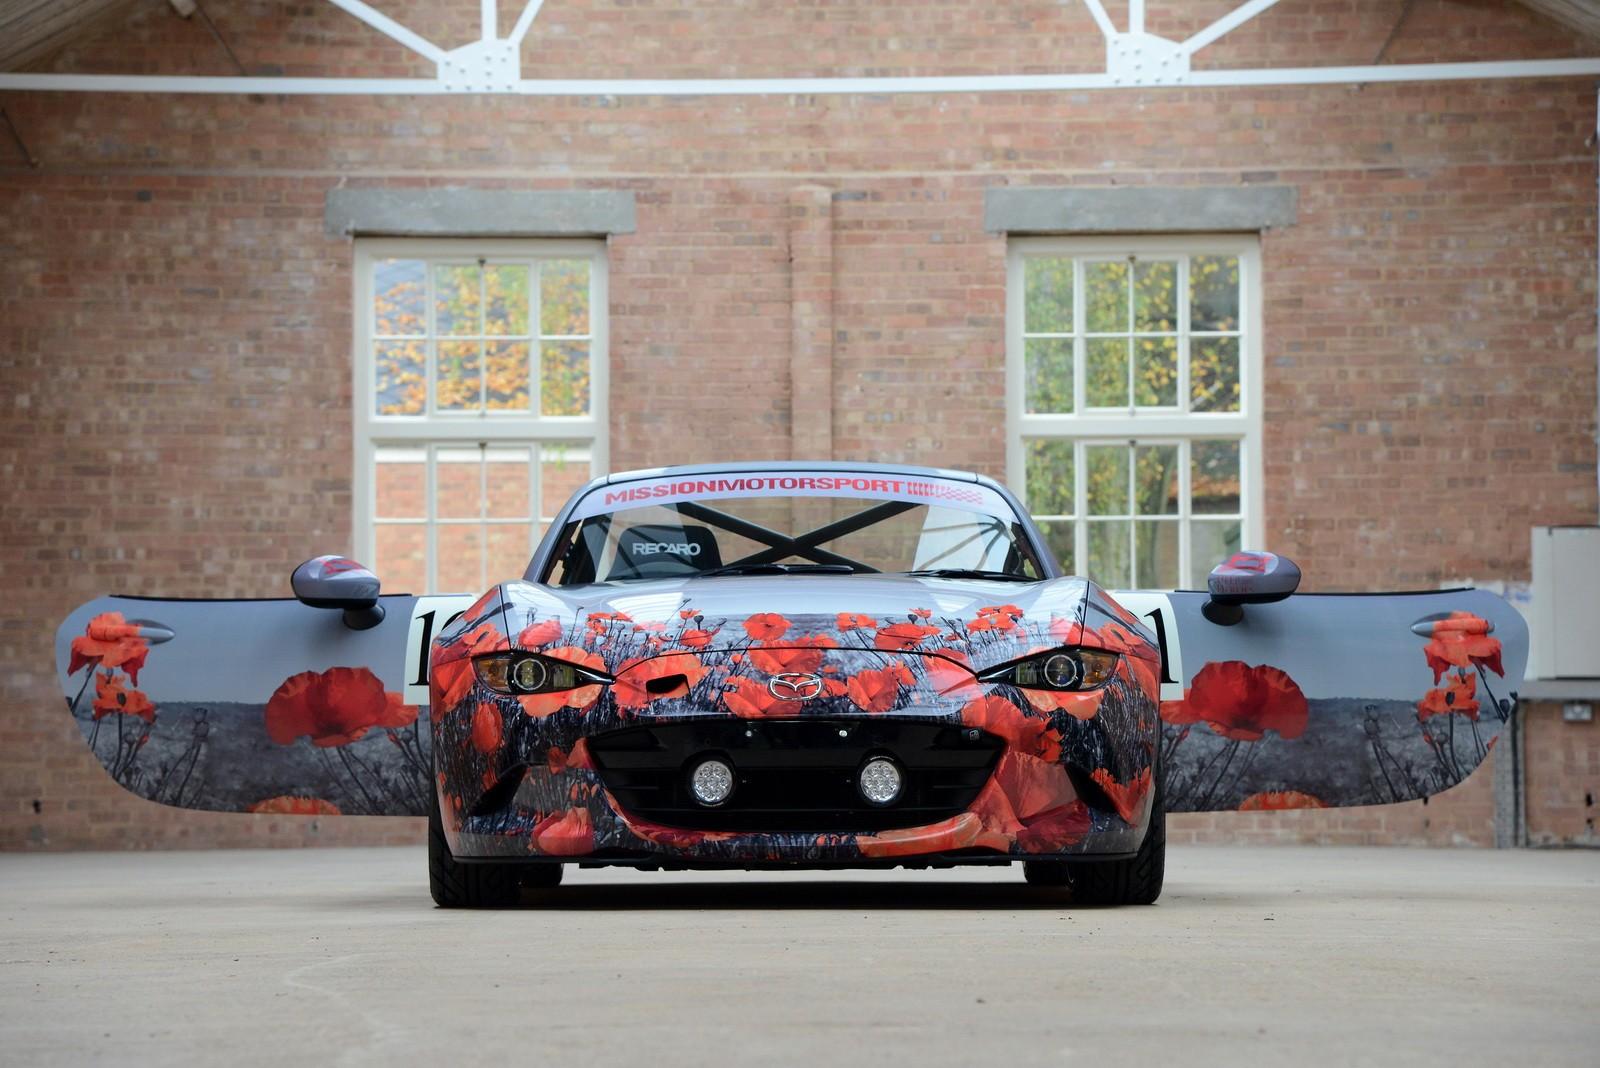 Miata with poppy art car livery isn t just for show autoevolution - 2016 Mazda Mx 5 Miata With Poppy Art Car Livery